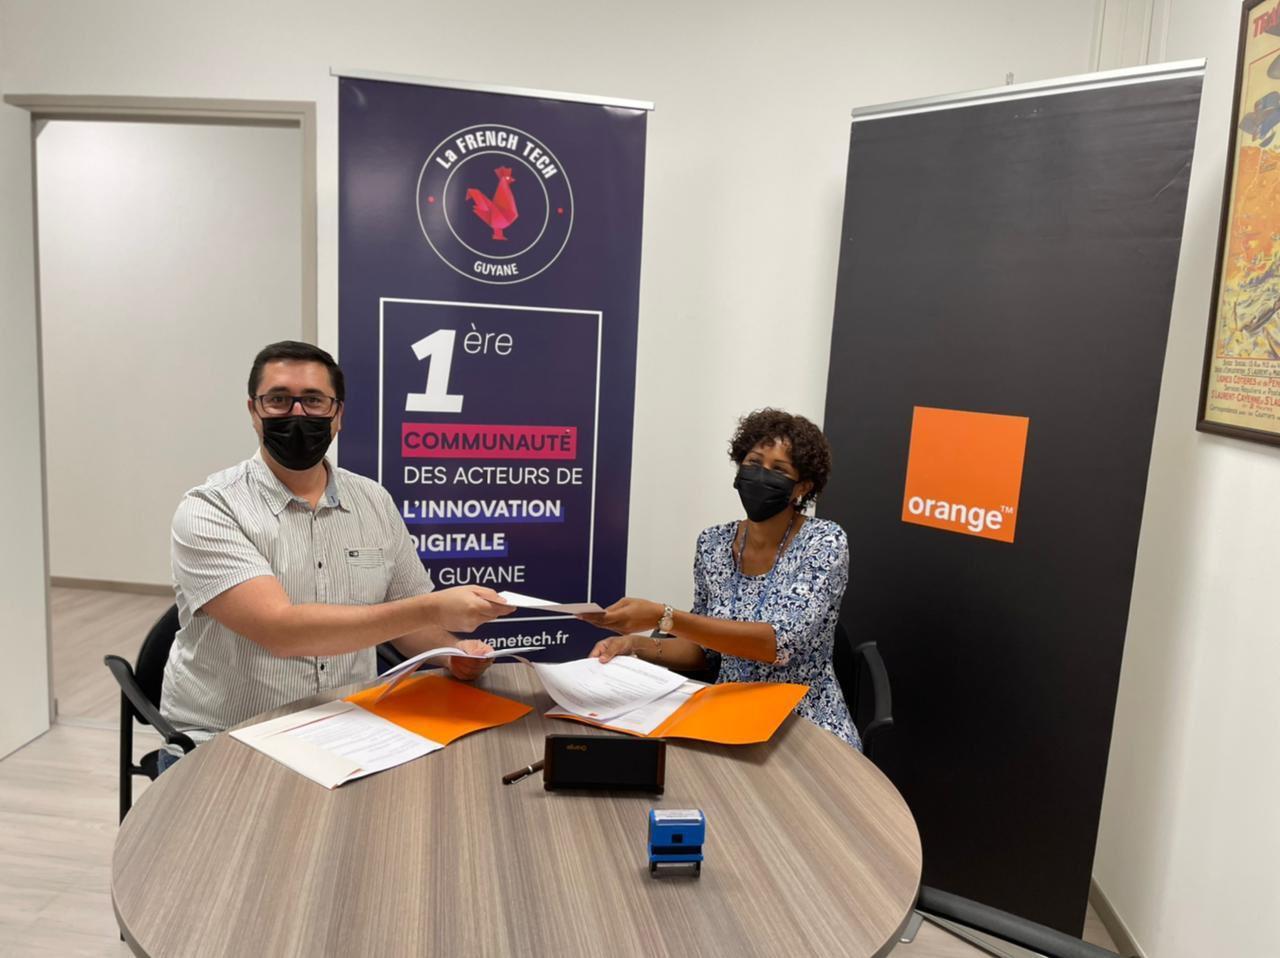 Innovation en Guyane : Orange signe une convention de partenariat avec French Tech Guyane